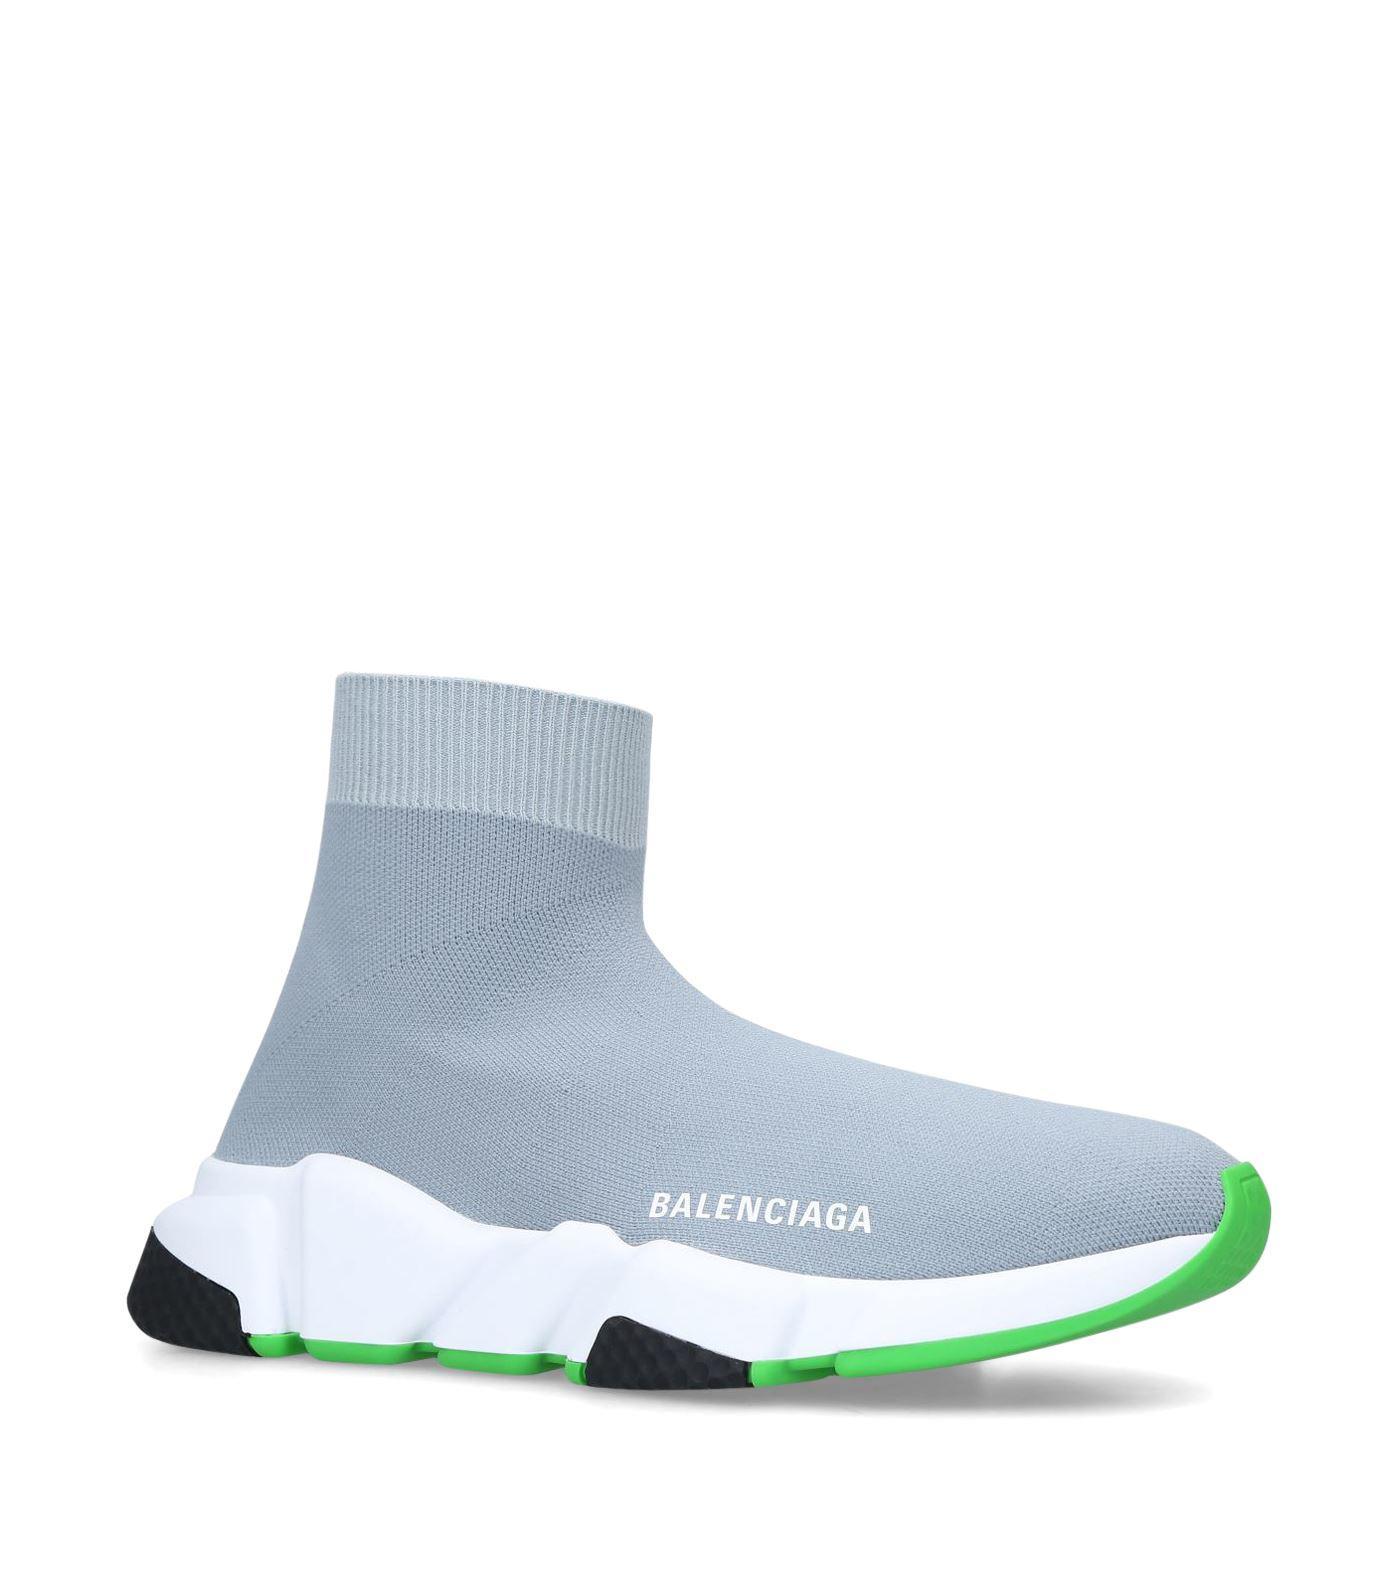 73af8f30ed7aea Balenciaga - Gray Speed High Top Sock Trainers - Lyst. View fullscreen